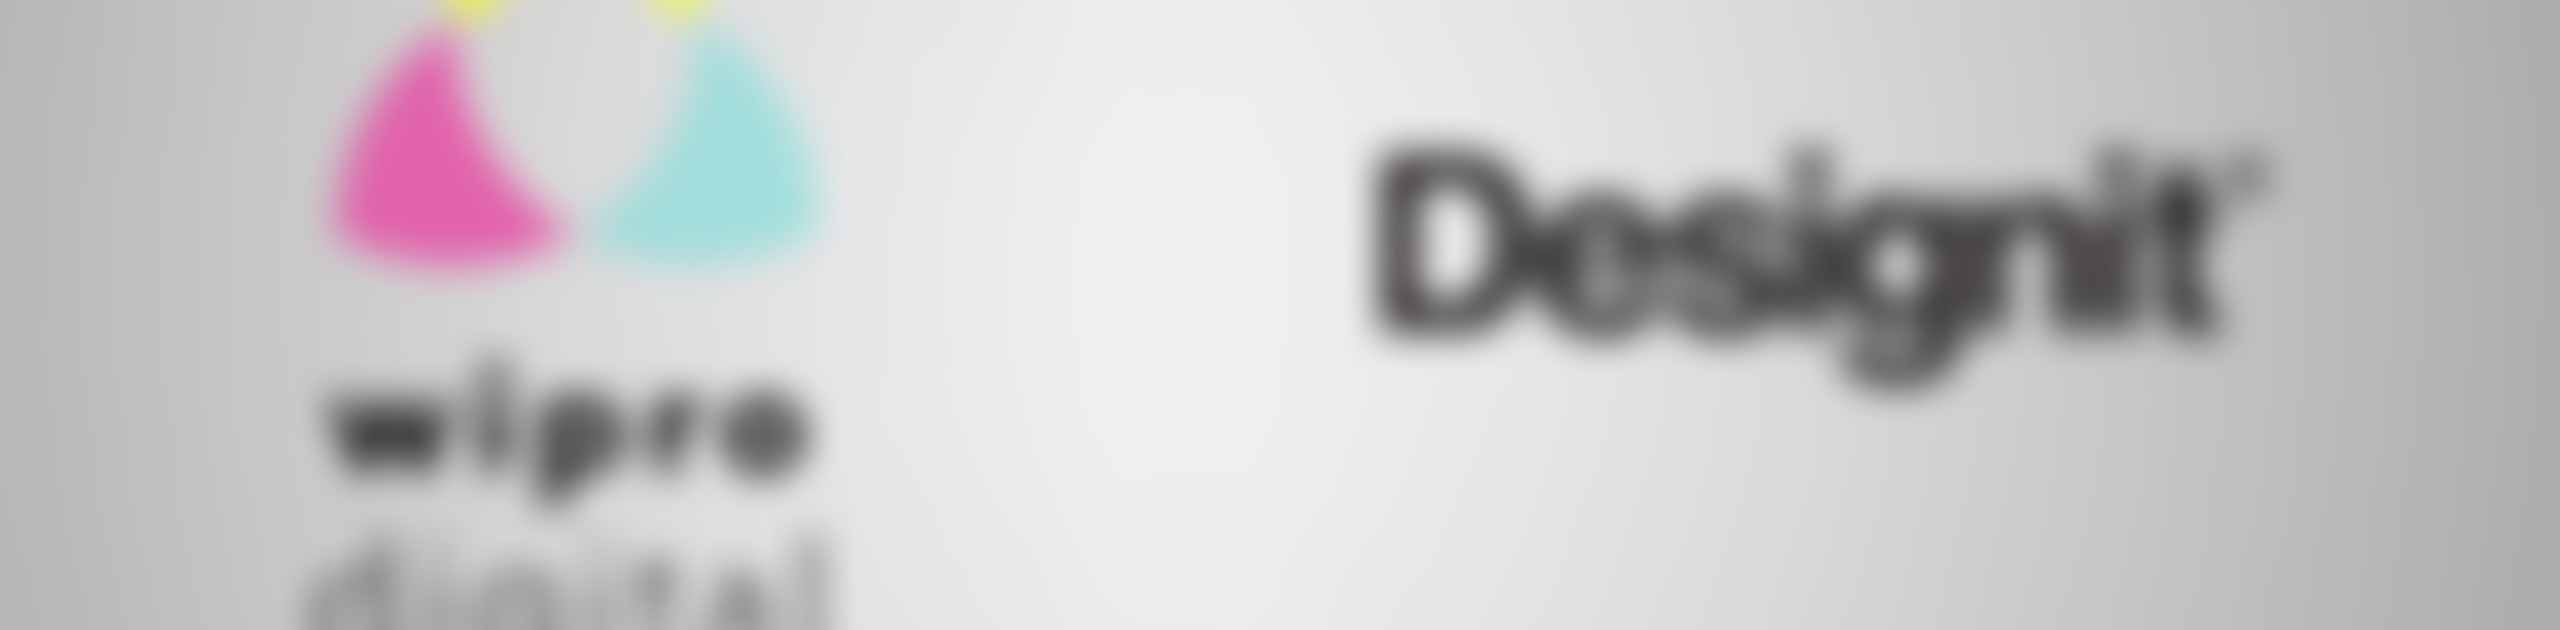 SDN Members Wipro Digital & Designit Set to Partner